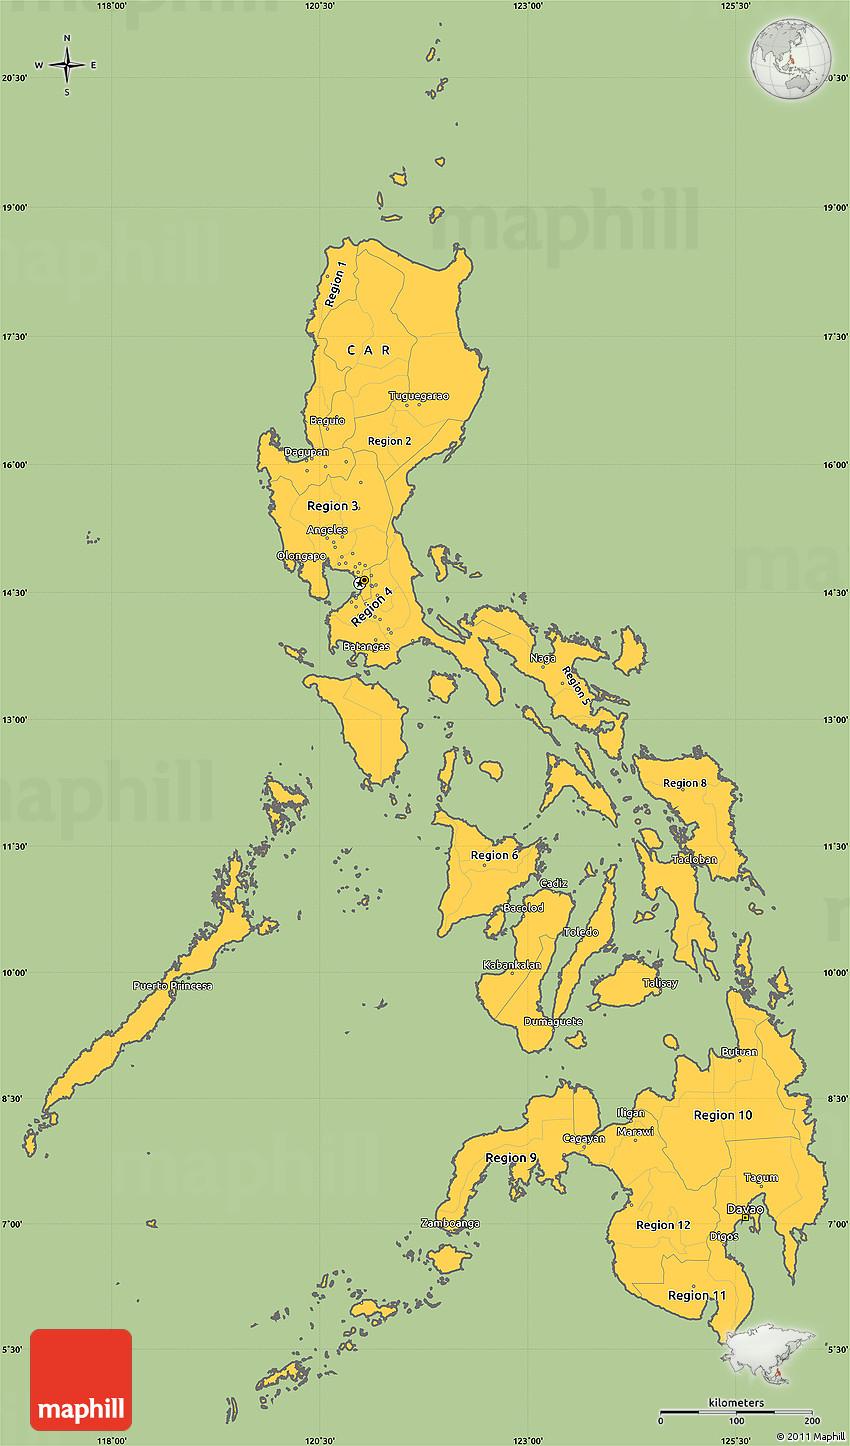 Savanna Style Simple Map of Philippines, cropped outside on simple map of fiji, simple map of usa, simple map of taiwan, simple map of belarus, simple map of nicaragua, simple map of the philippines, simple map of dominican republic, simple map of serbia, simple map of uk, simple map of hungary, simple map of sudan, simple map of andorra, simple map of kazakhstan, simple map of grenada, simple map of california, simple map of slovenia, simple map of chad, simple map of pakistan, simple map of united arab emirates, simple map of cambodia,